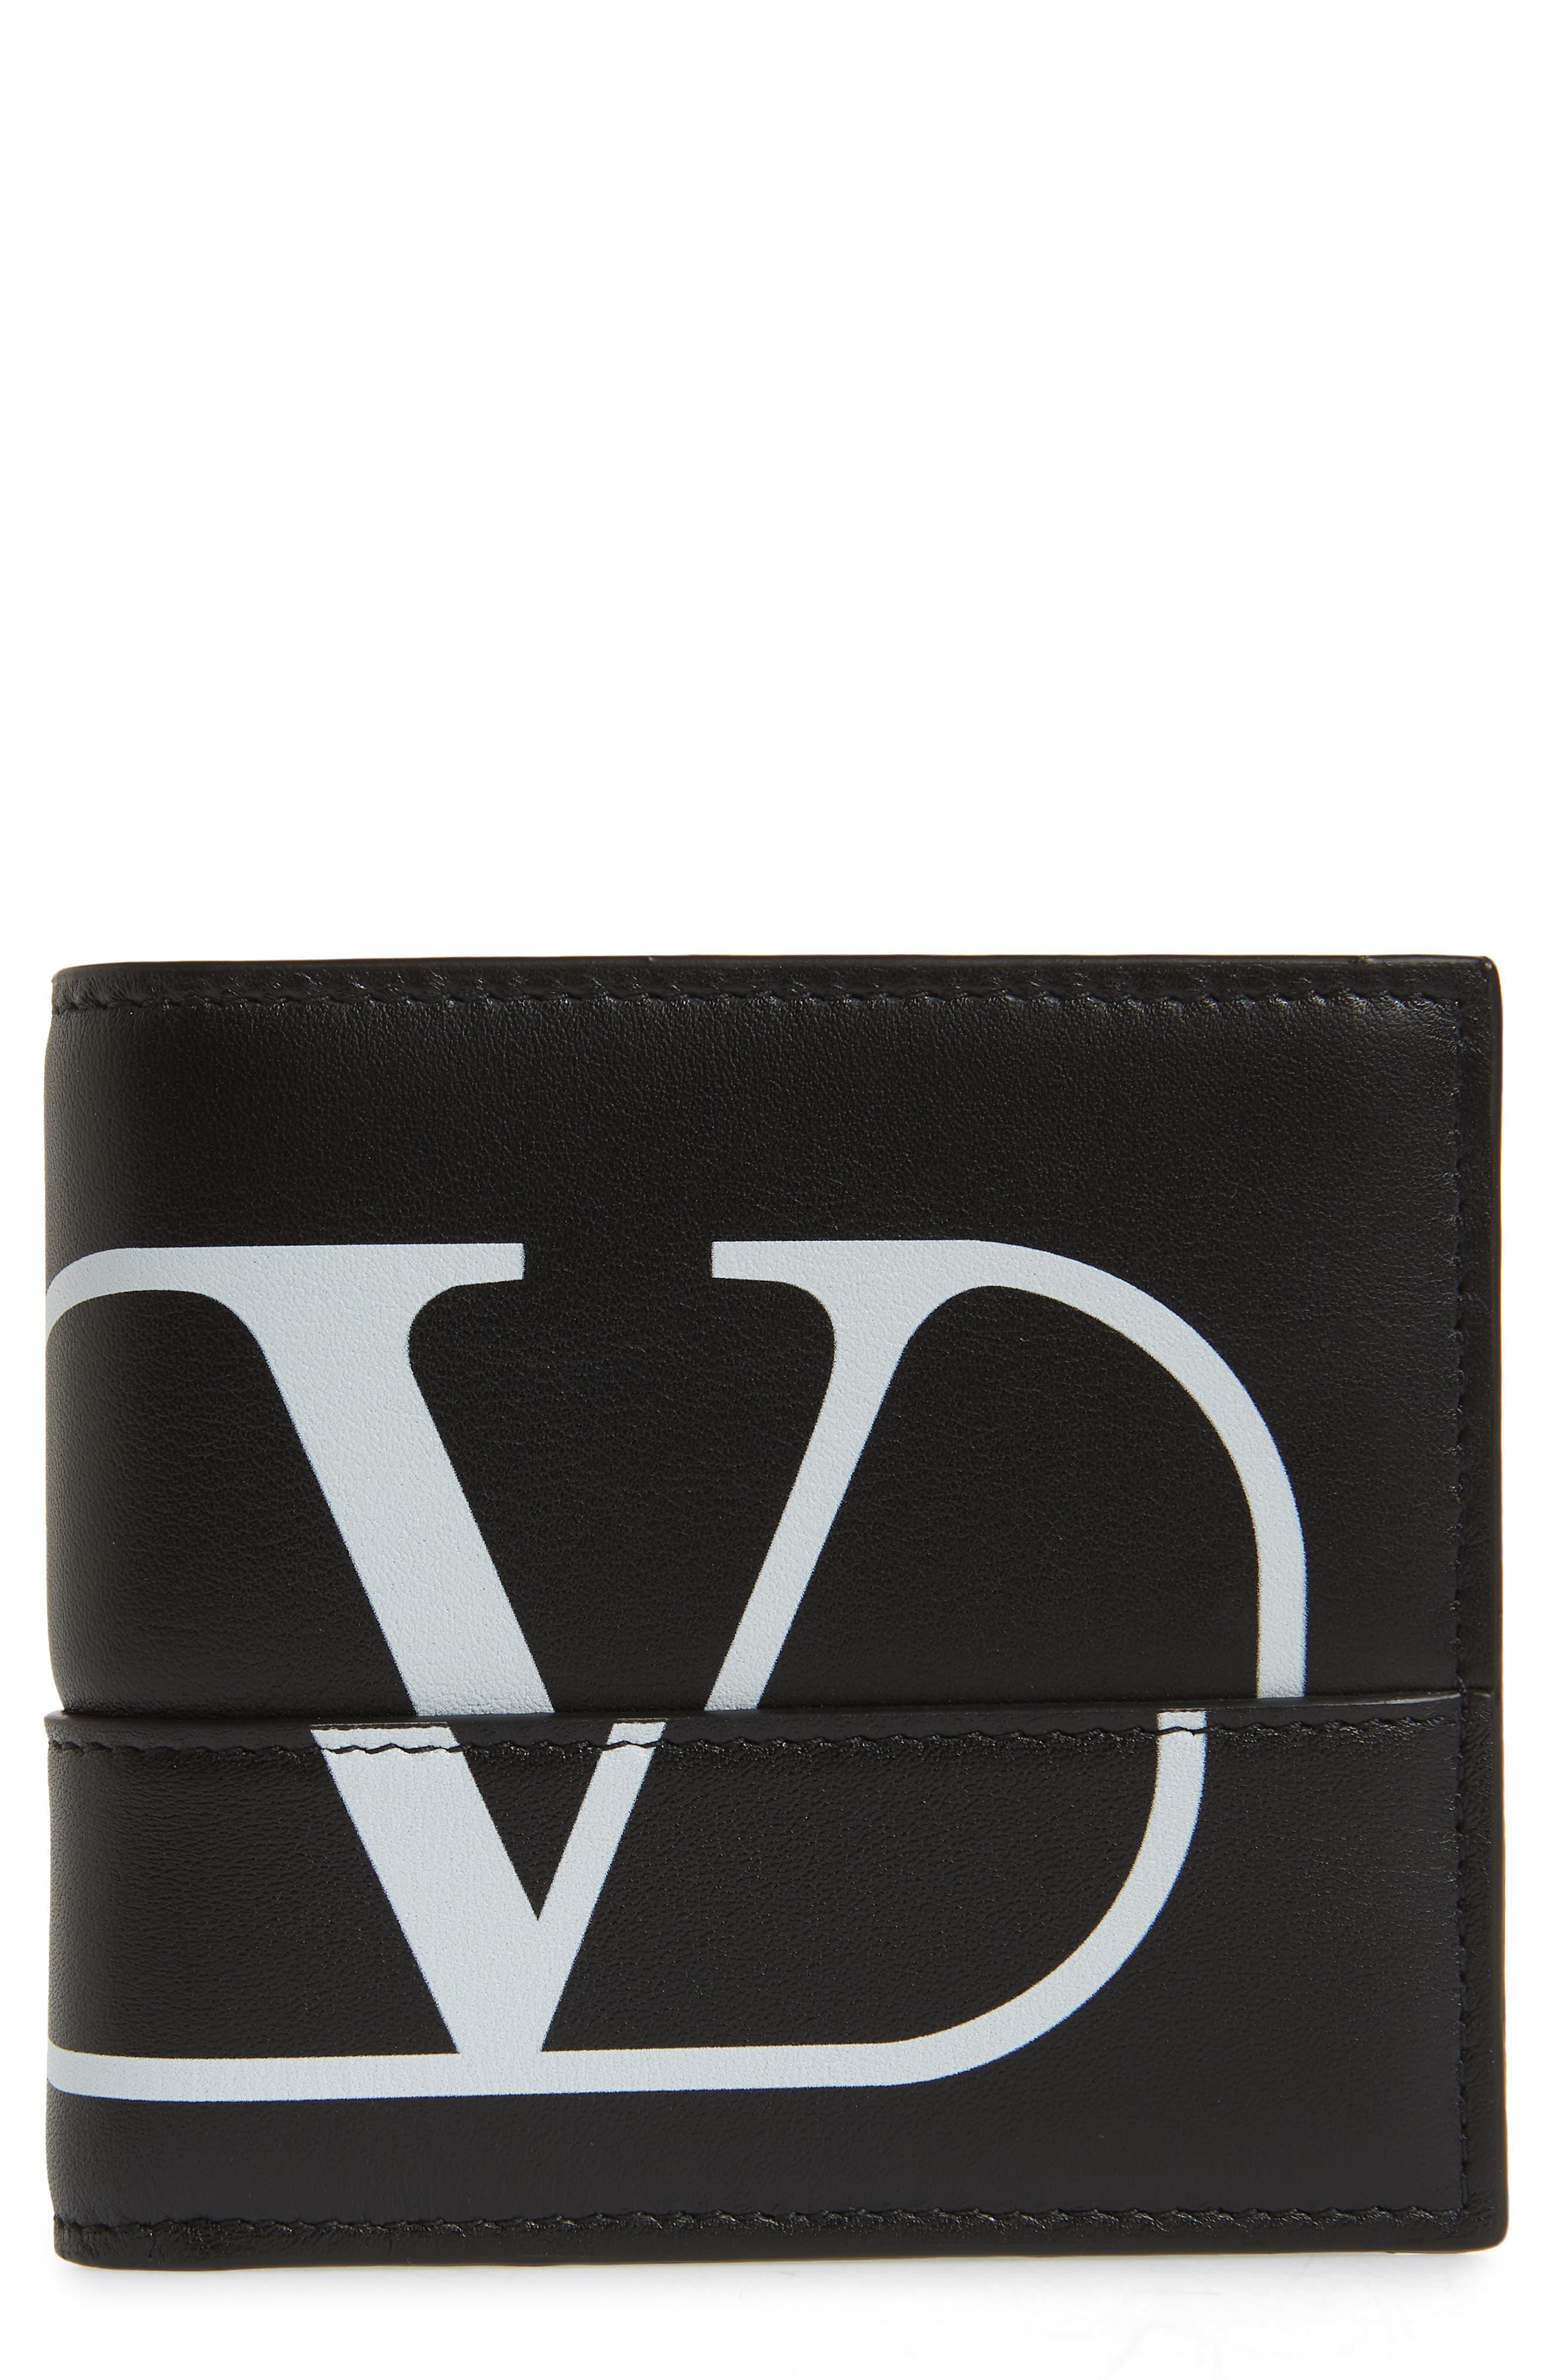 GARAVANI V-Logo Leather Wallet, Main, color, BLACK WHITE